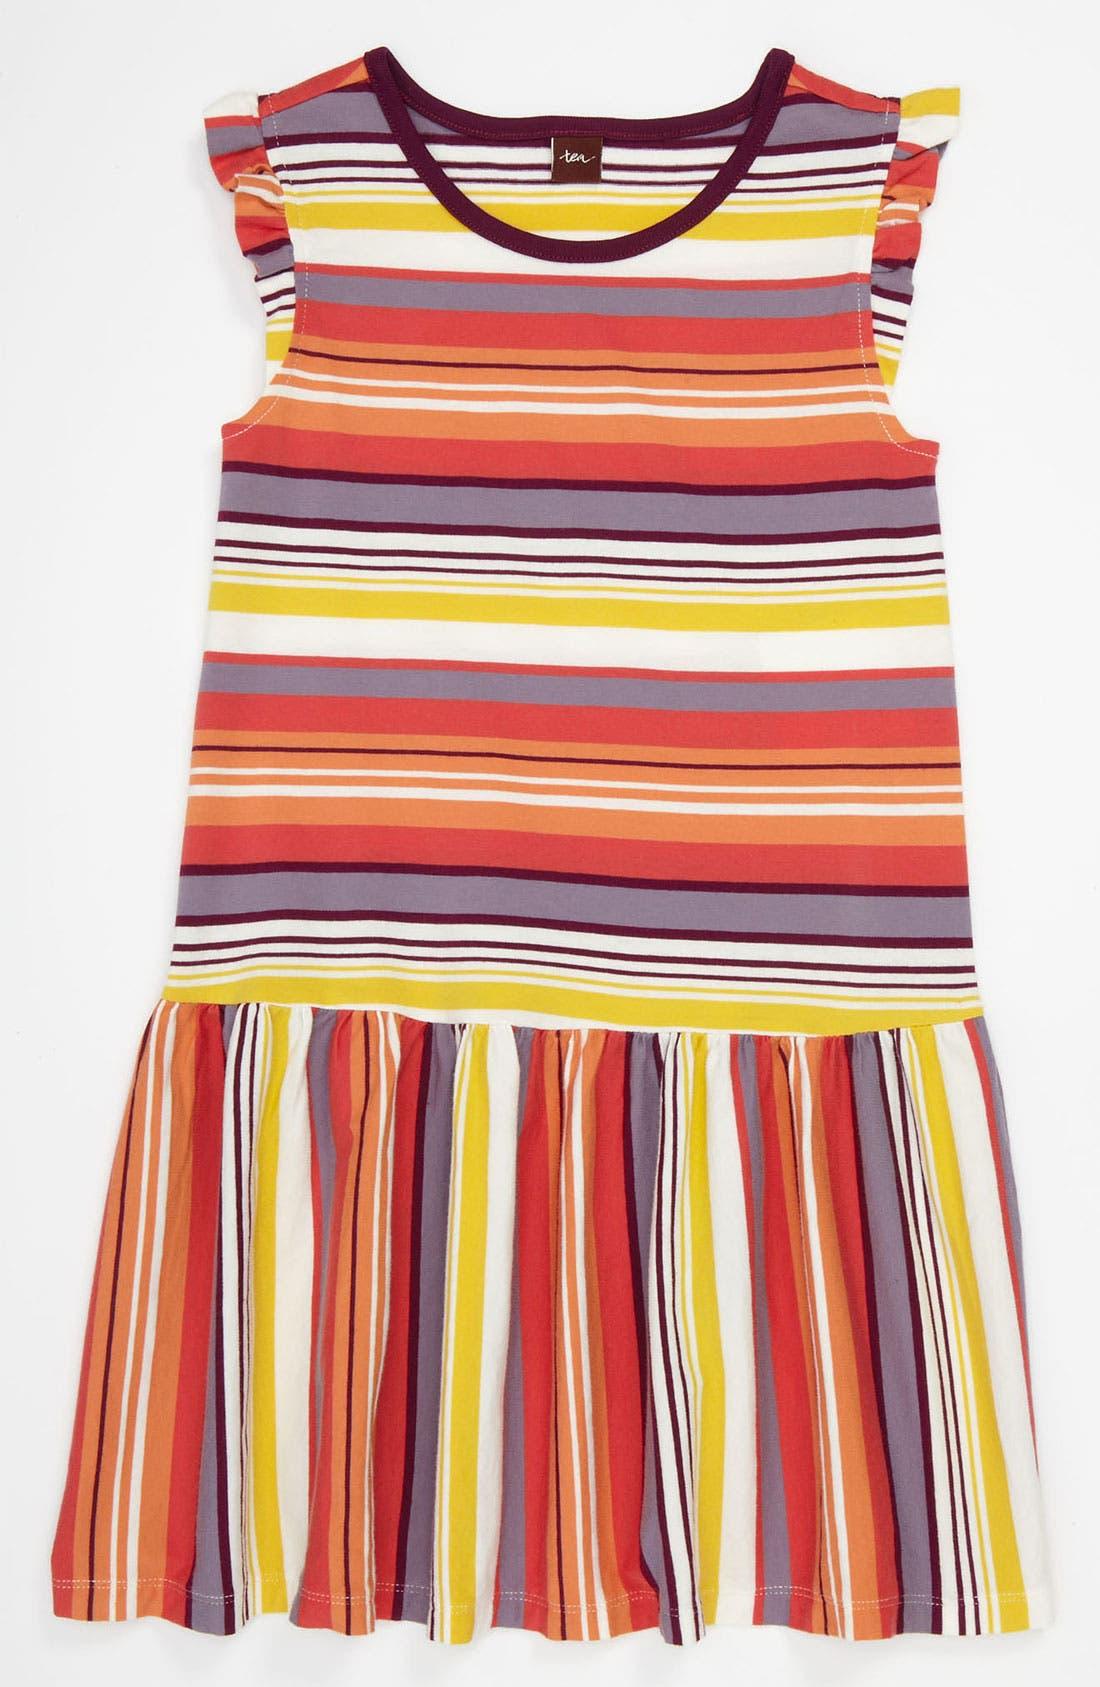 Main Image - Tea Collection 'Sunset Stripe' Dress (Little Girls & Big Girls)